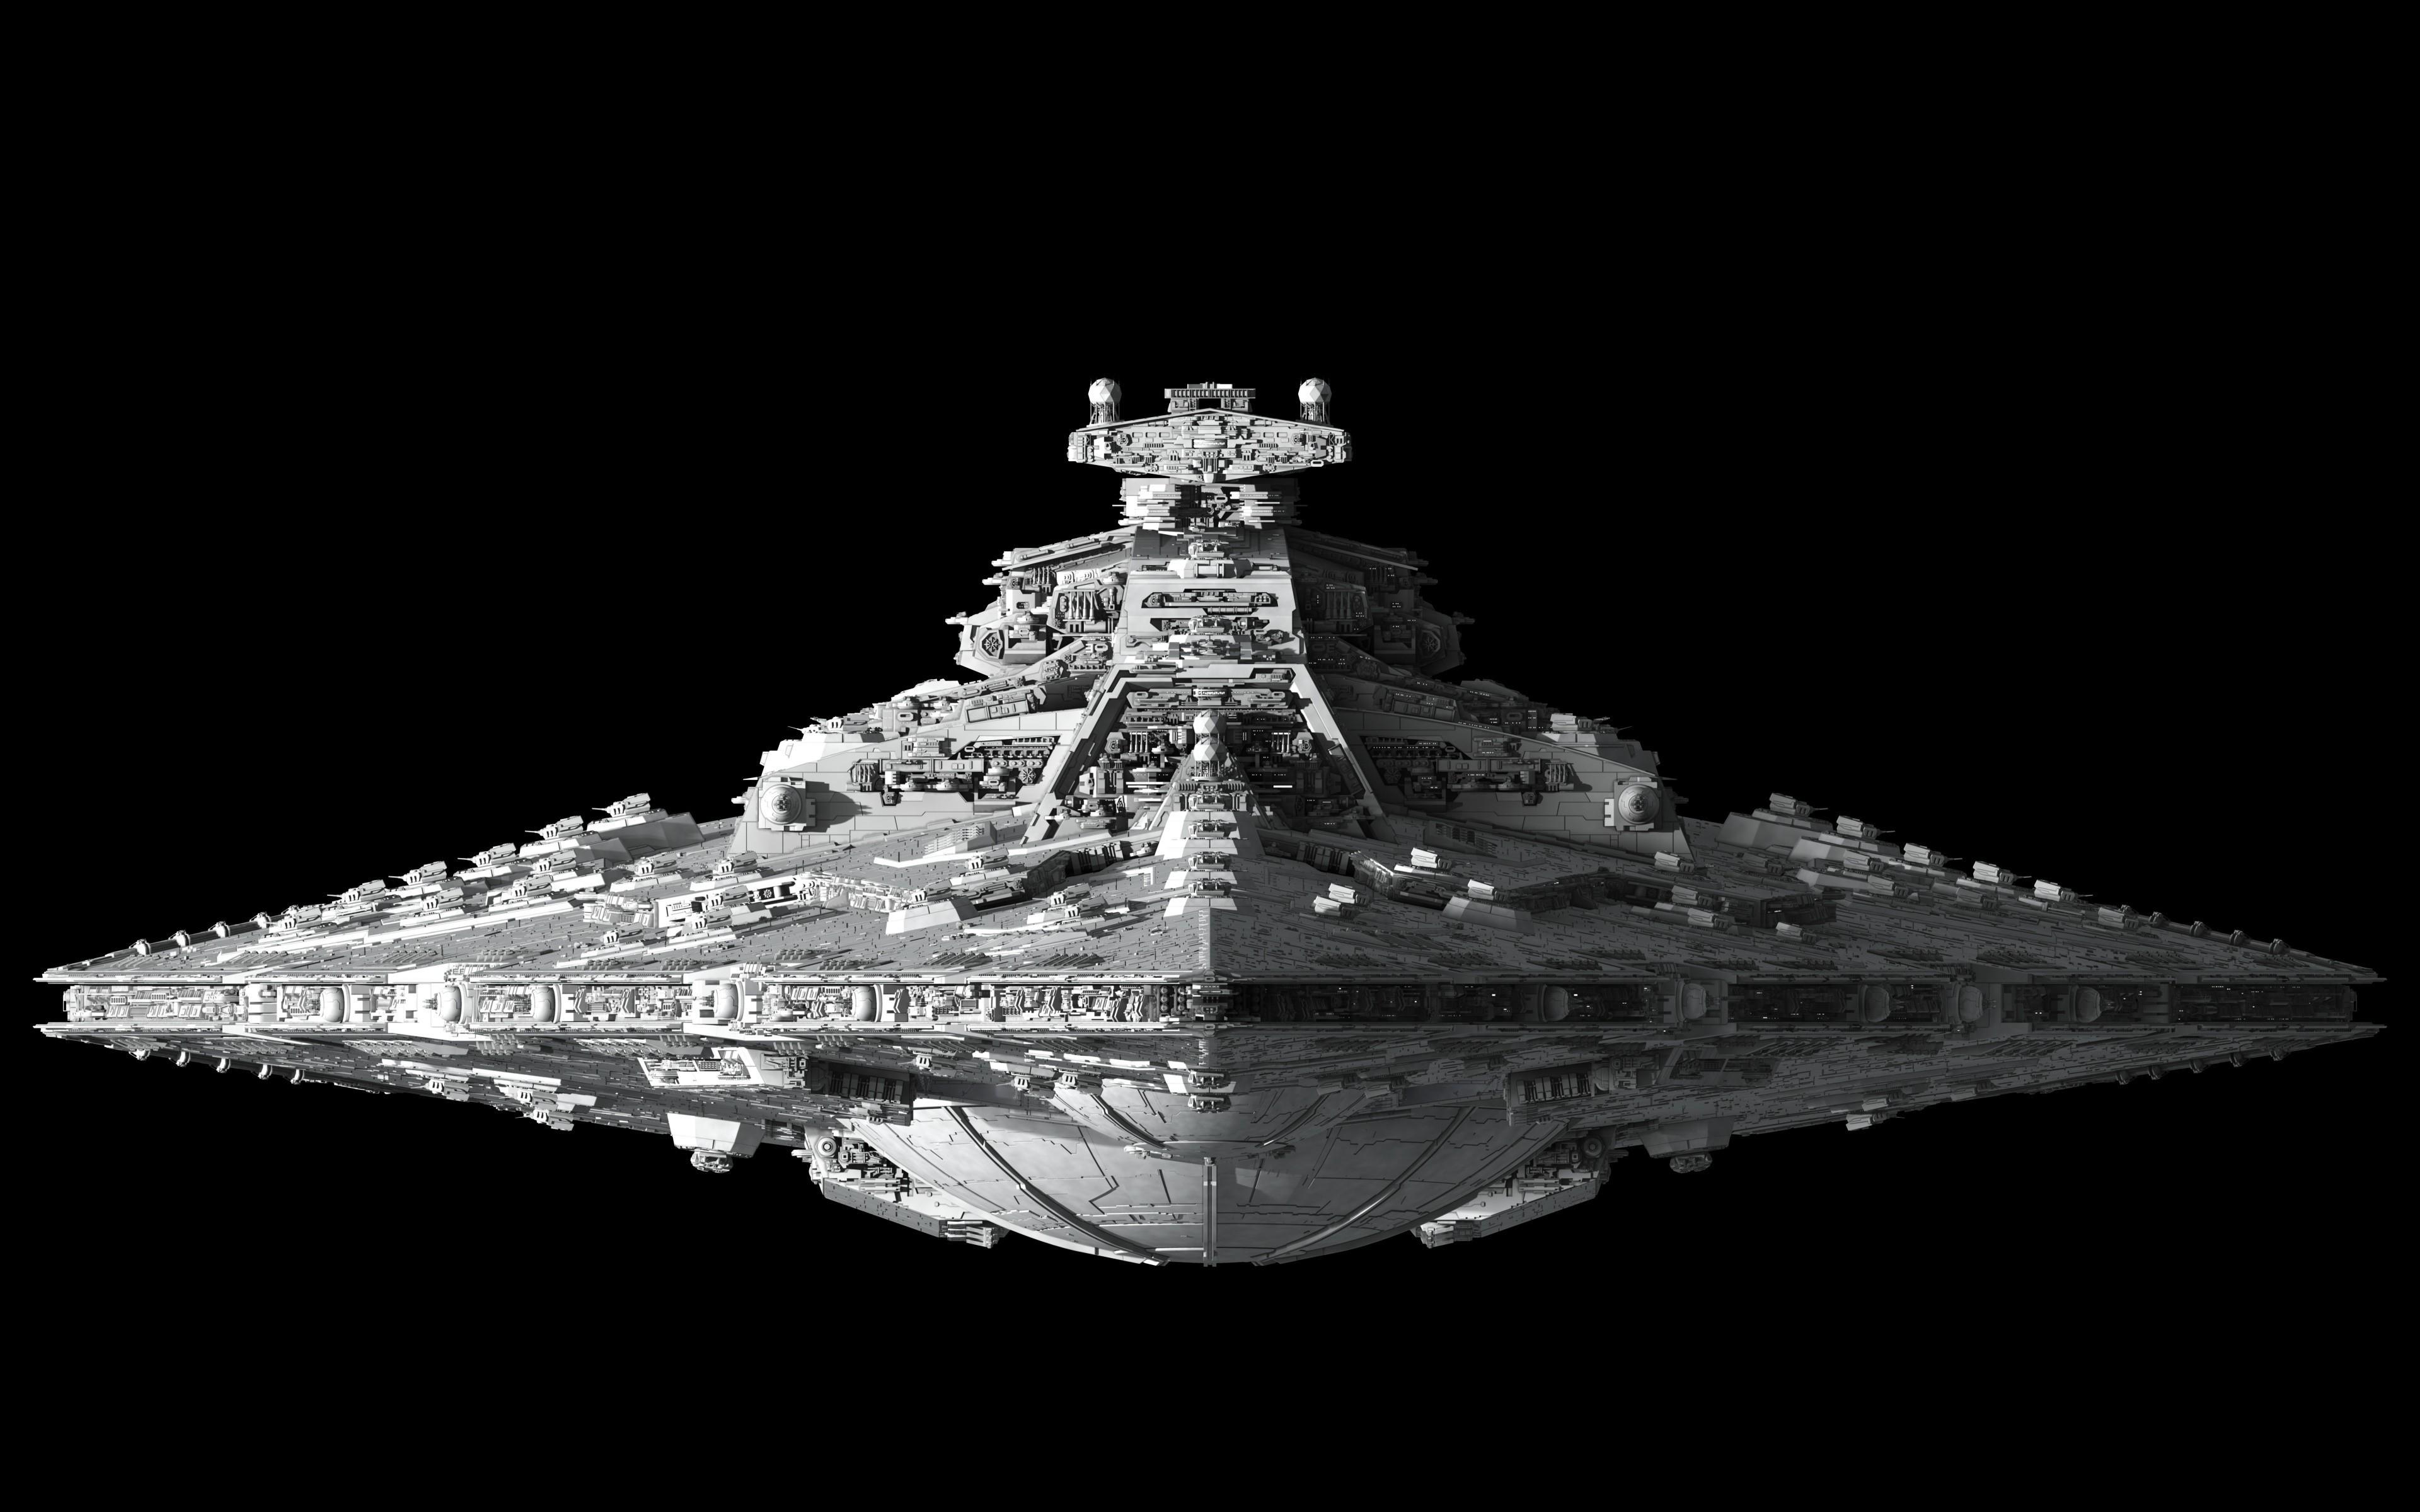 sci fi star wars wars spaceship spacecraft 3d cg digital art wallpaper 3840x2400 24094. Black Bedroom Furniture Sets. Home Design Ideas